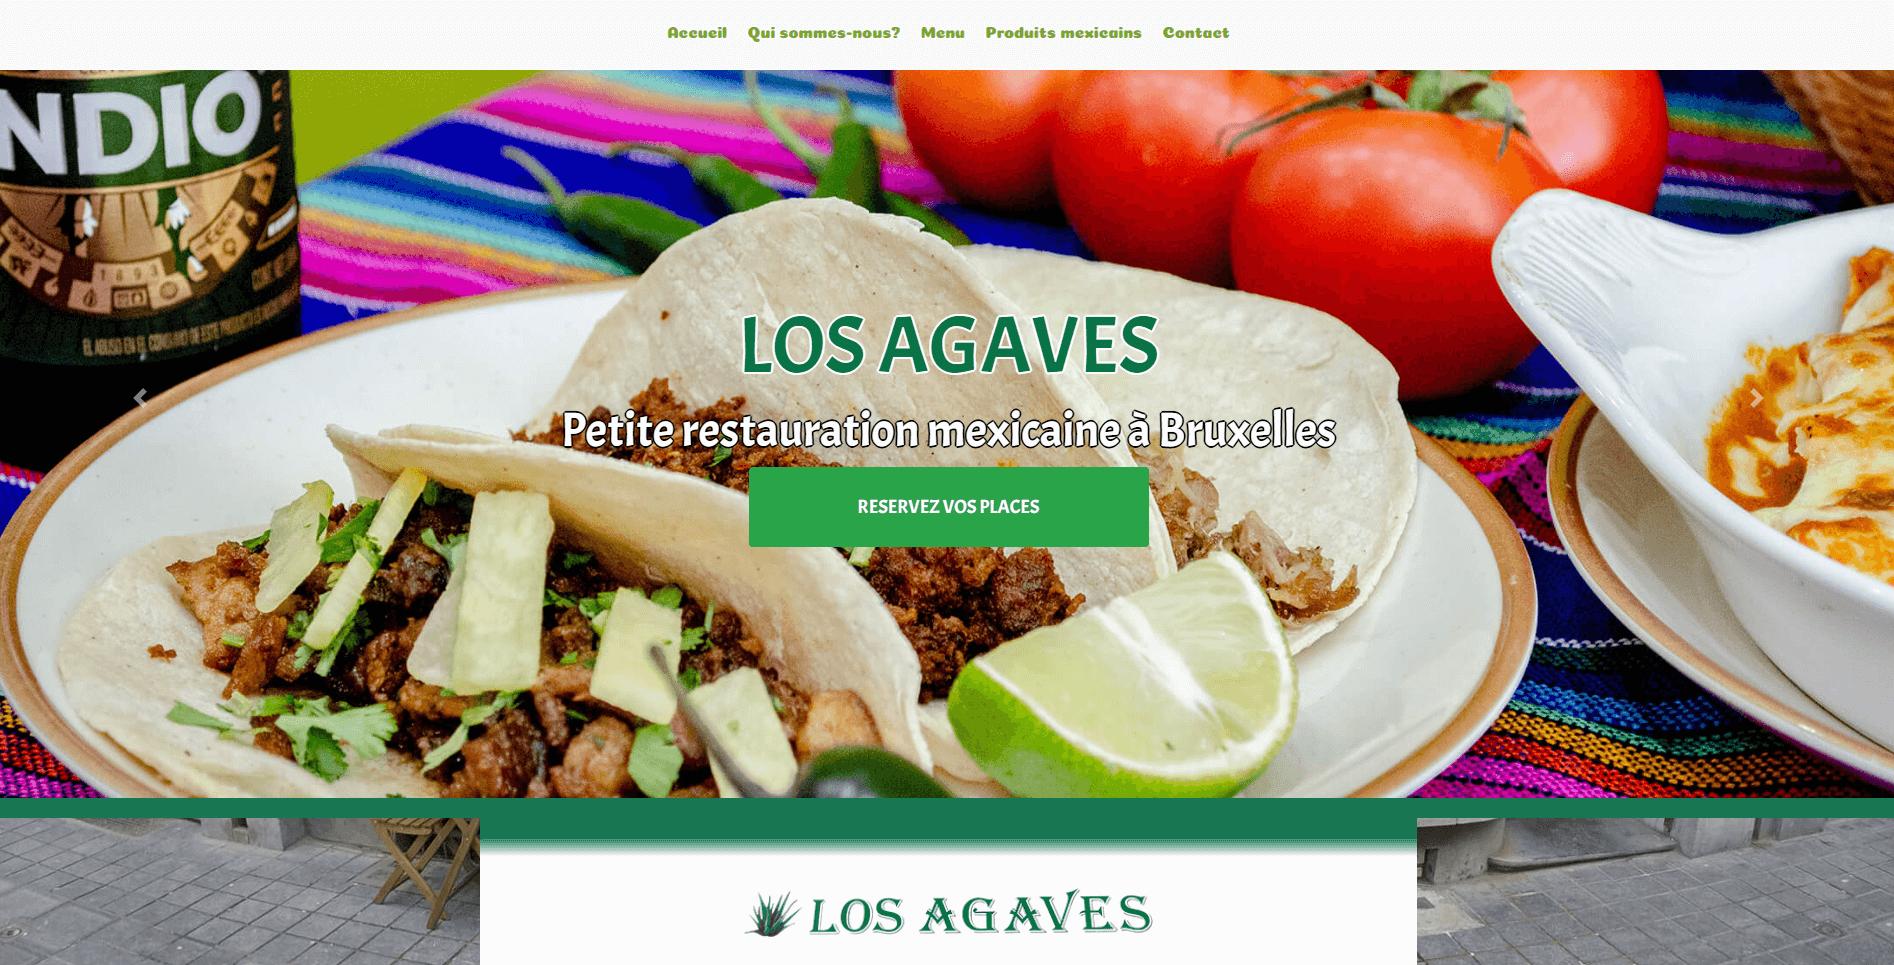 logagavessite1